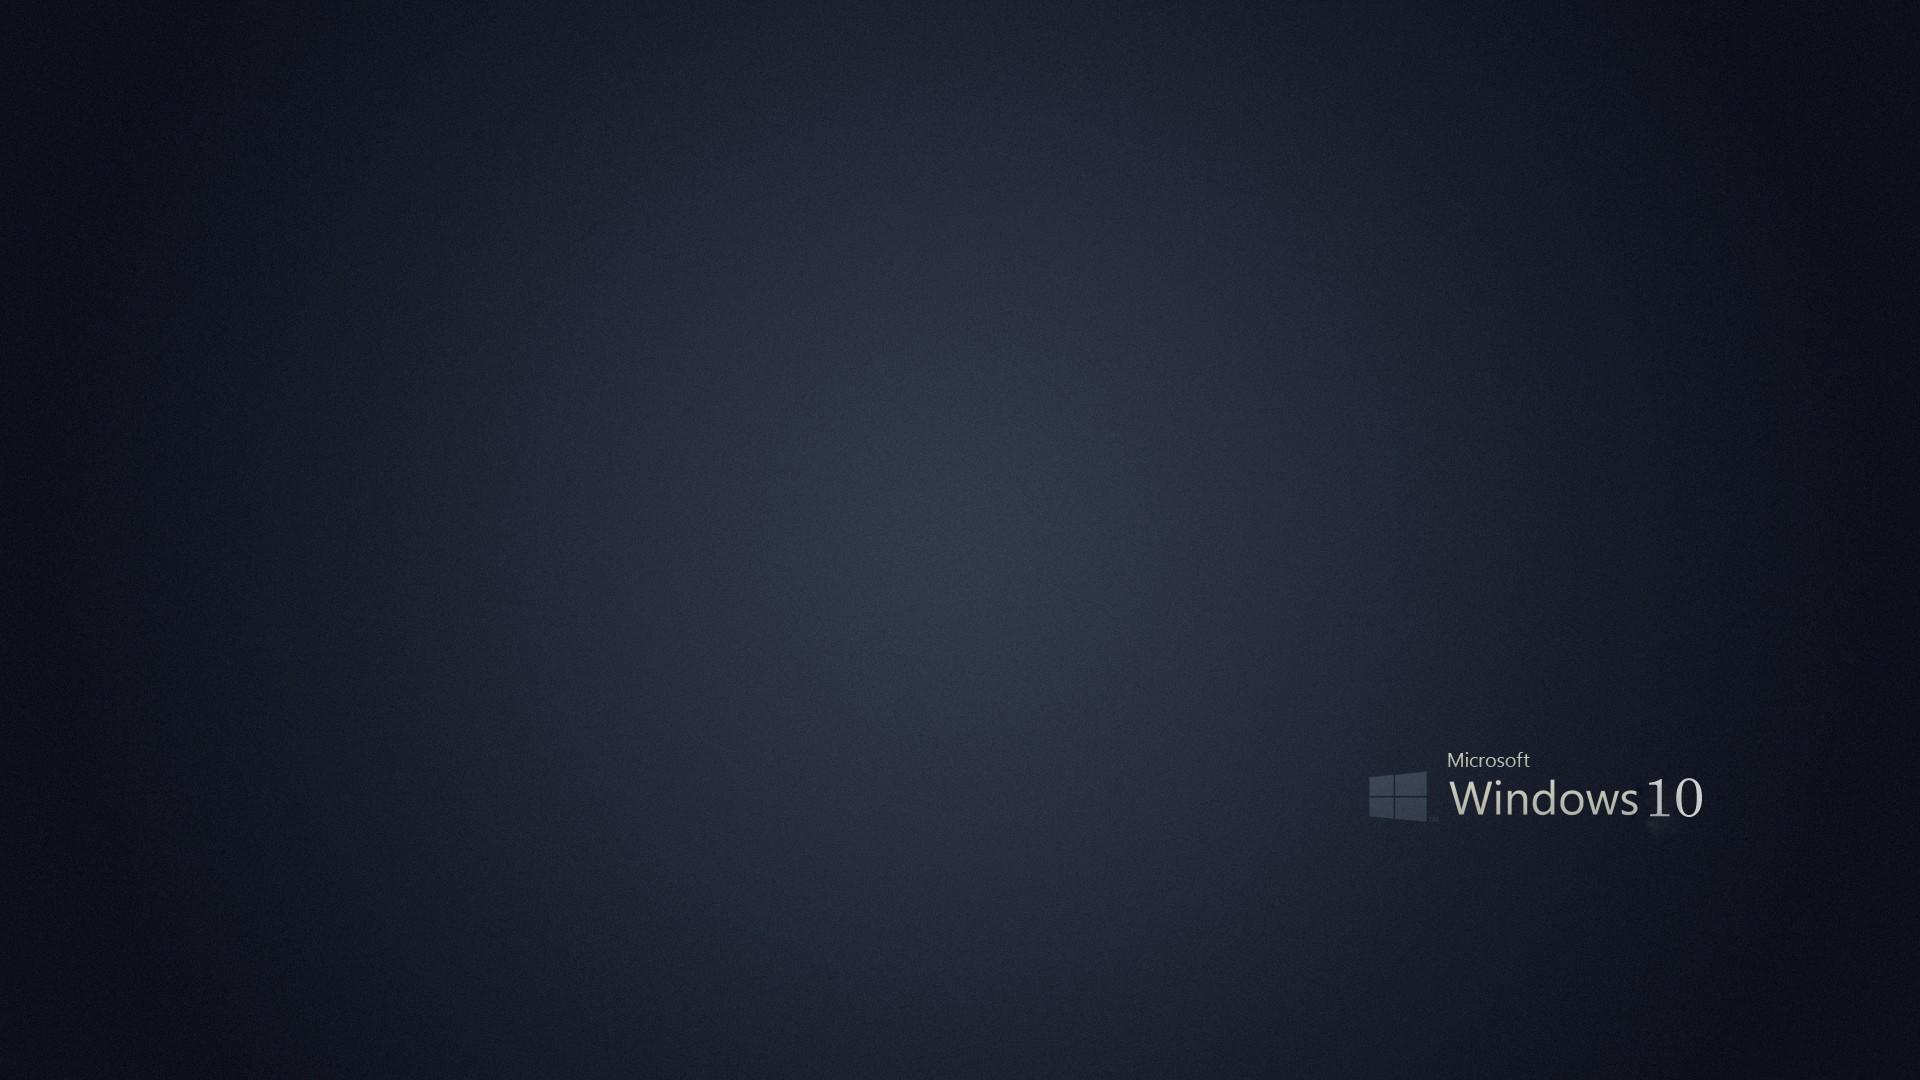 1920x1080 Cool Dark Windows 10 Wallpaper Download